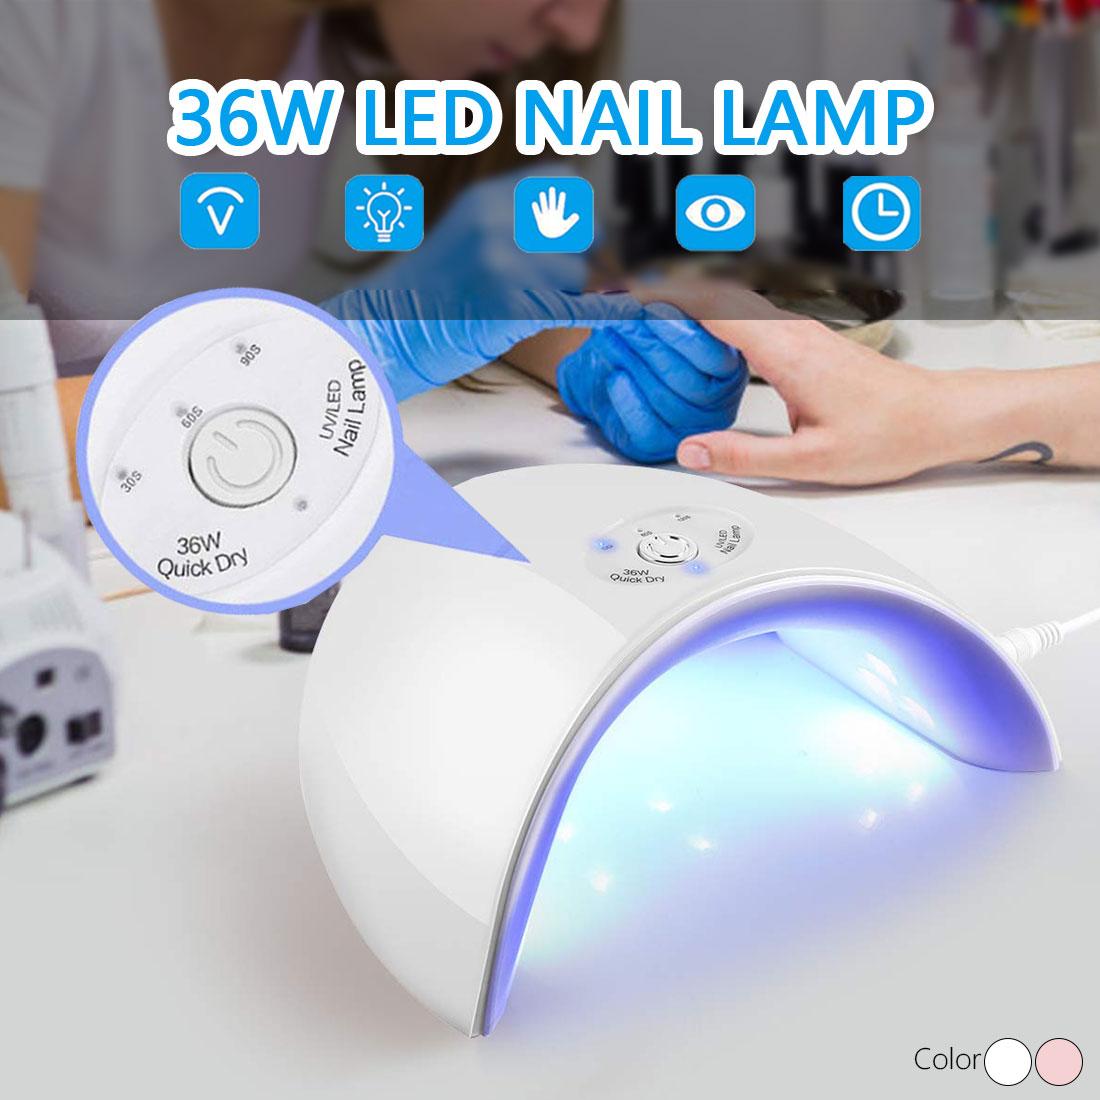 36/6W UV LED Lamp Nail UV Lamp Nail Gel Polish Machine 12LEDs Timer Control 60s/120s/Always-on Manicure Pedicure Varnish Dryer